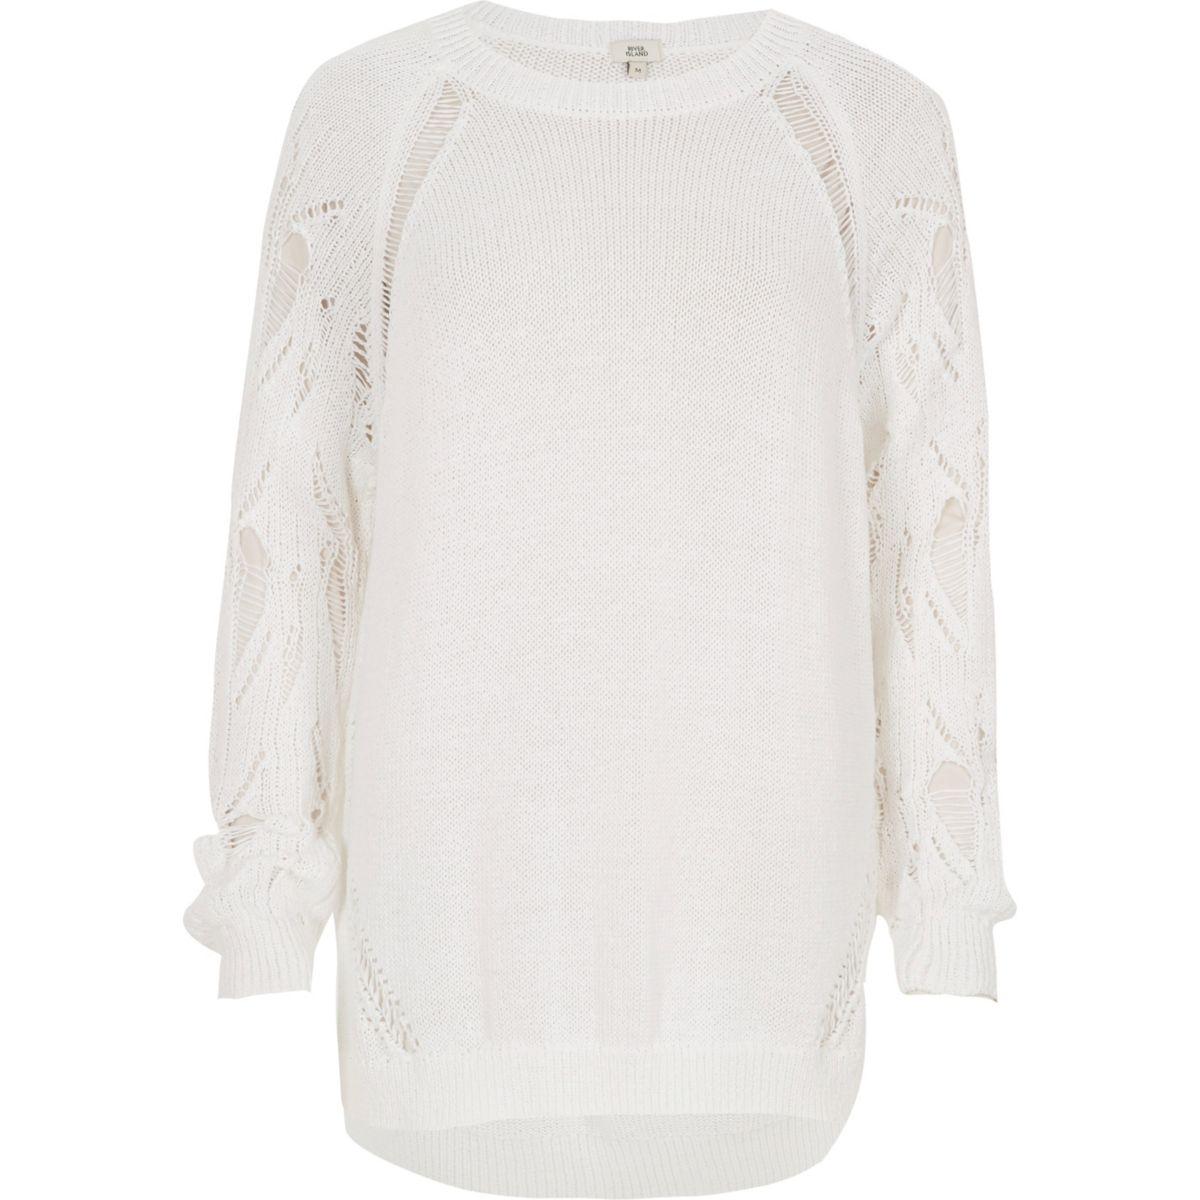 White knit ladder sleeve jumper